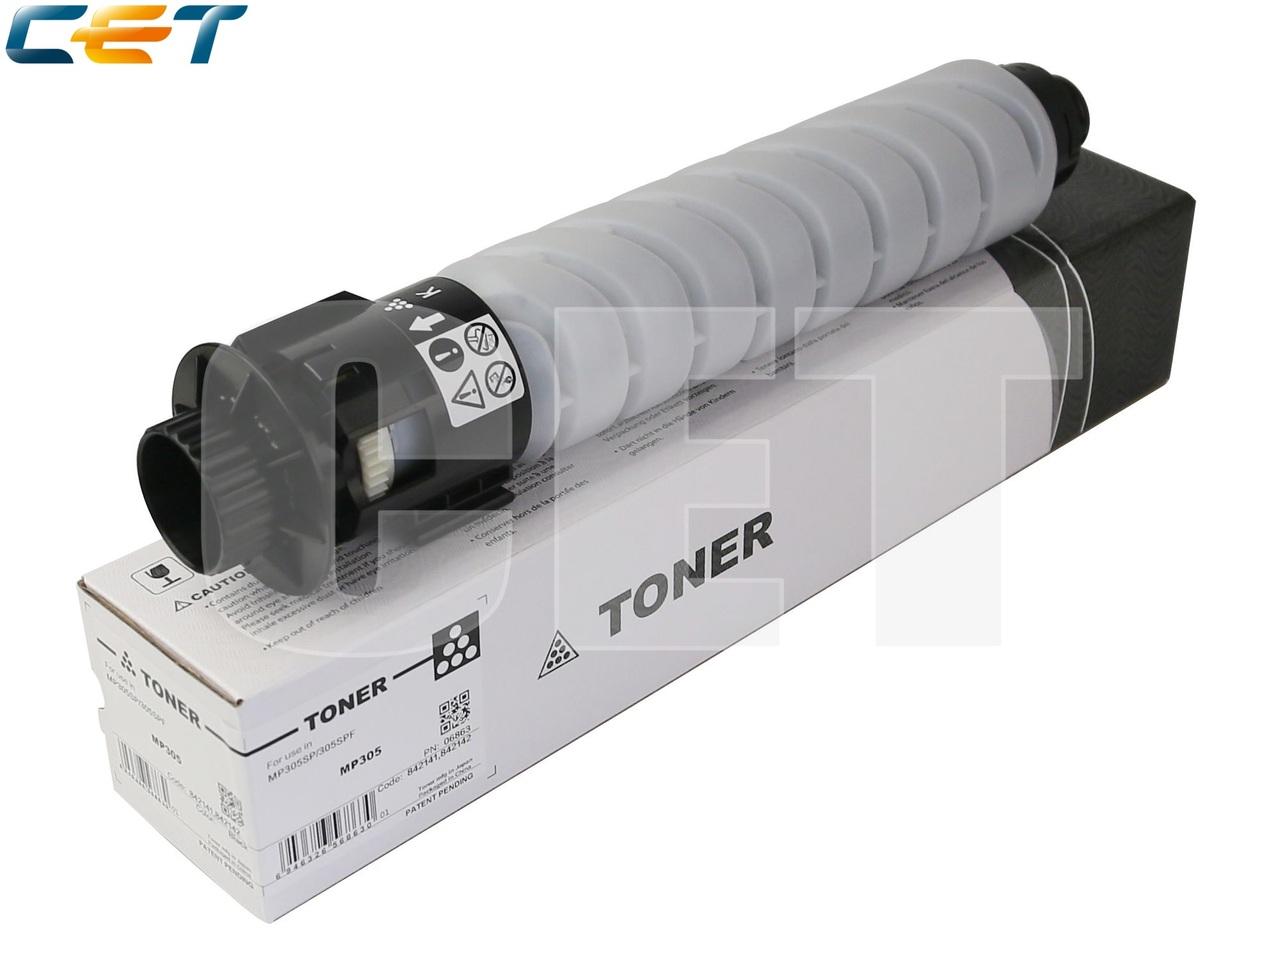 Тонер-картридж (CPP) 842142 для RICOH MP305SP/305SPF(CET), 230г, 9000 стр., CET6863